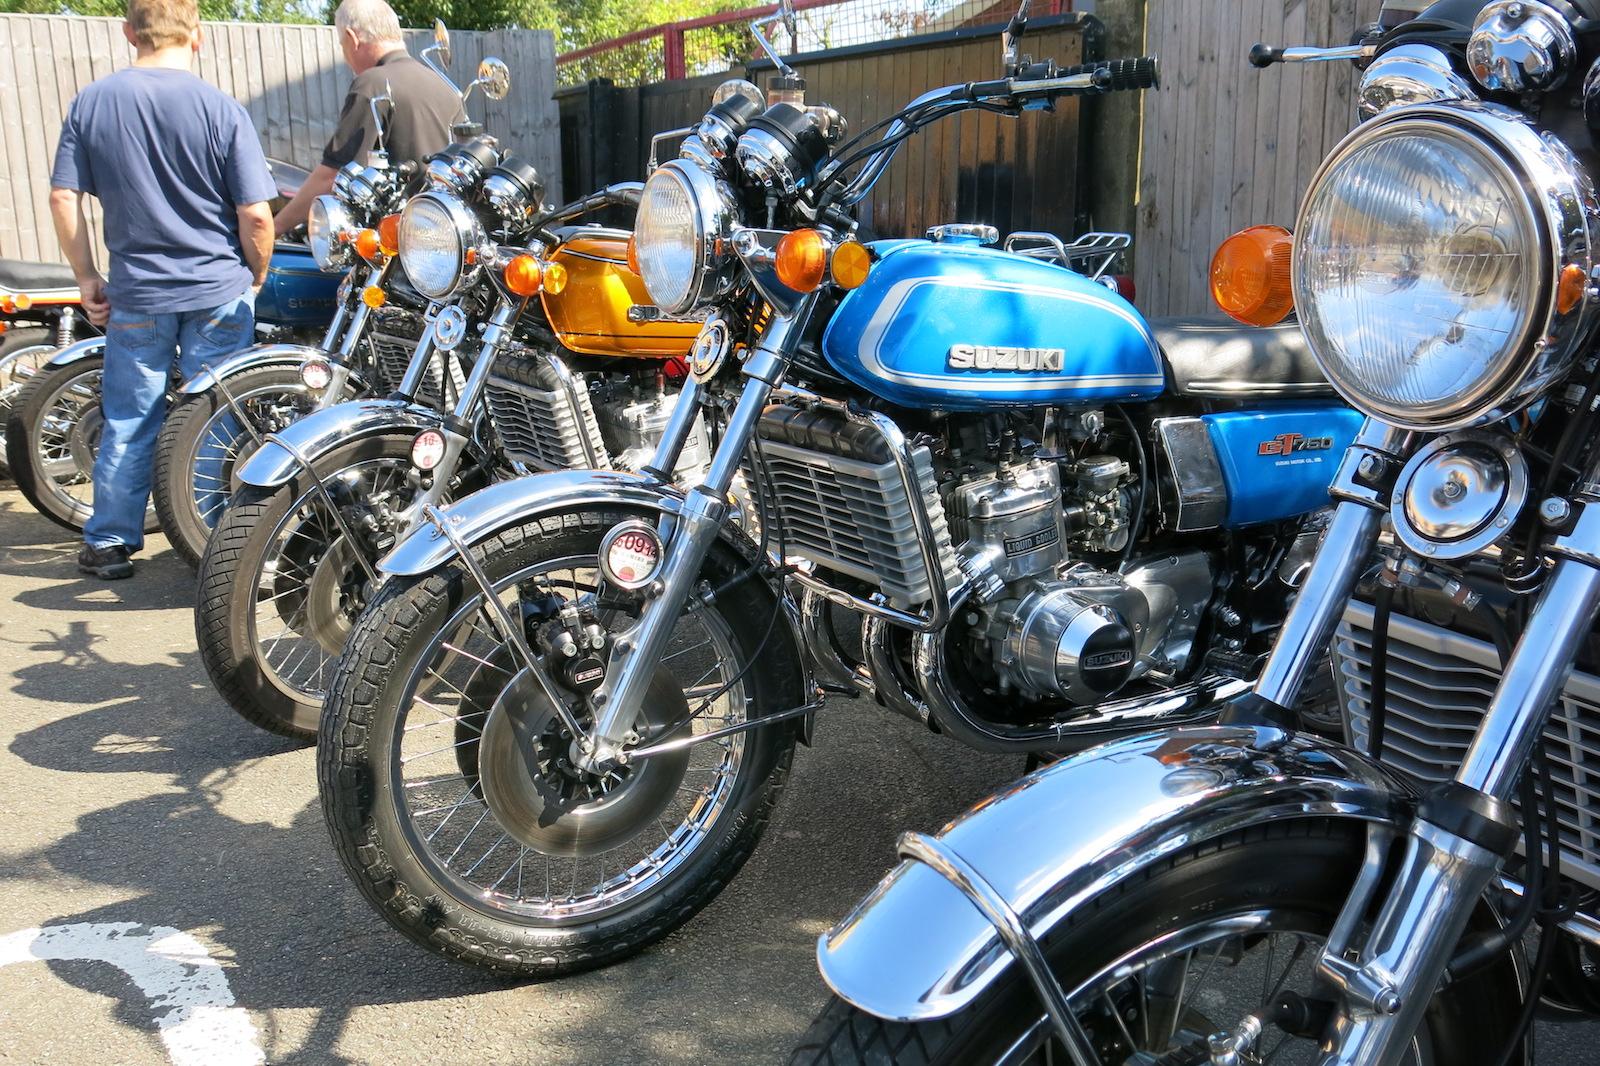 Suzuki Classic trackday